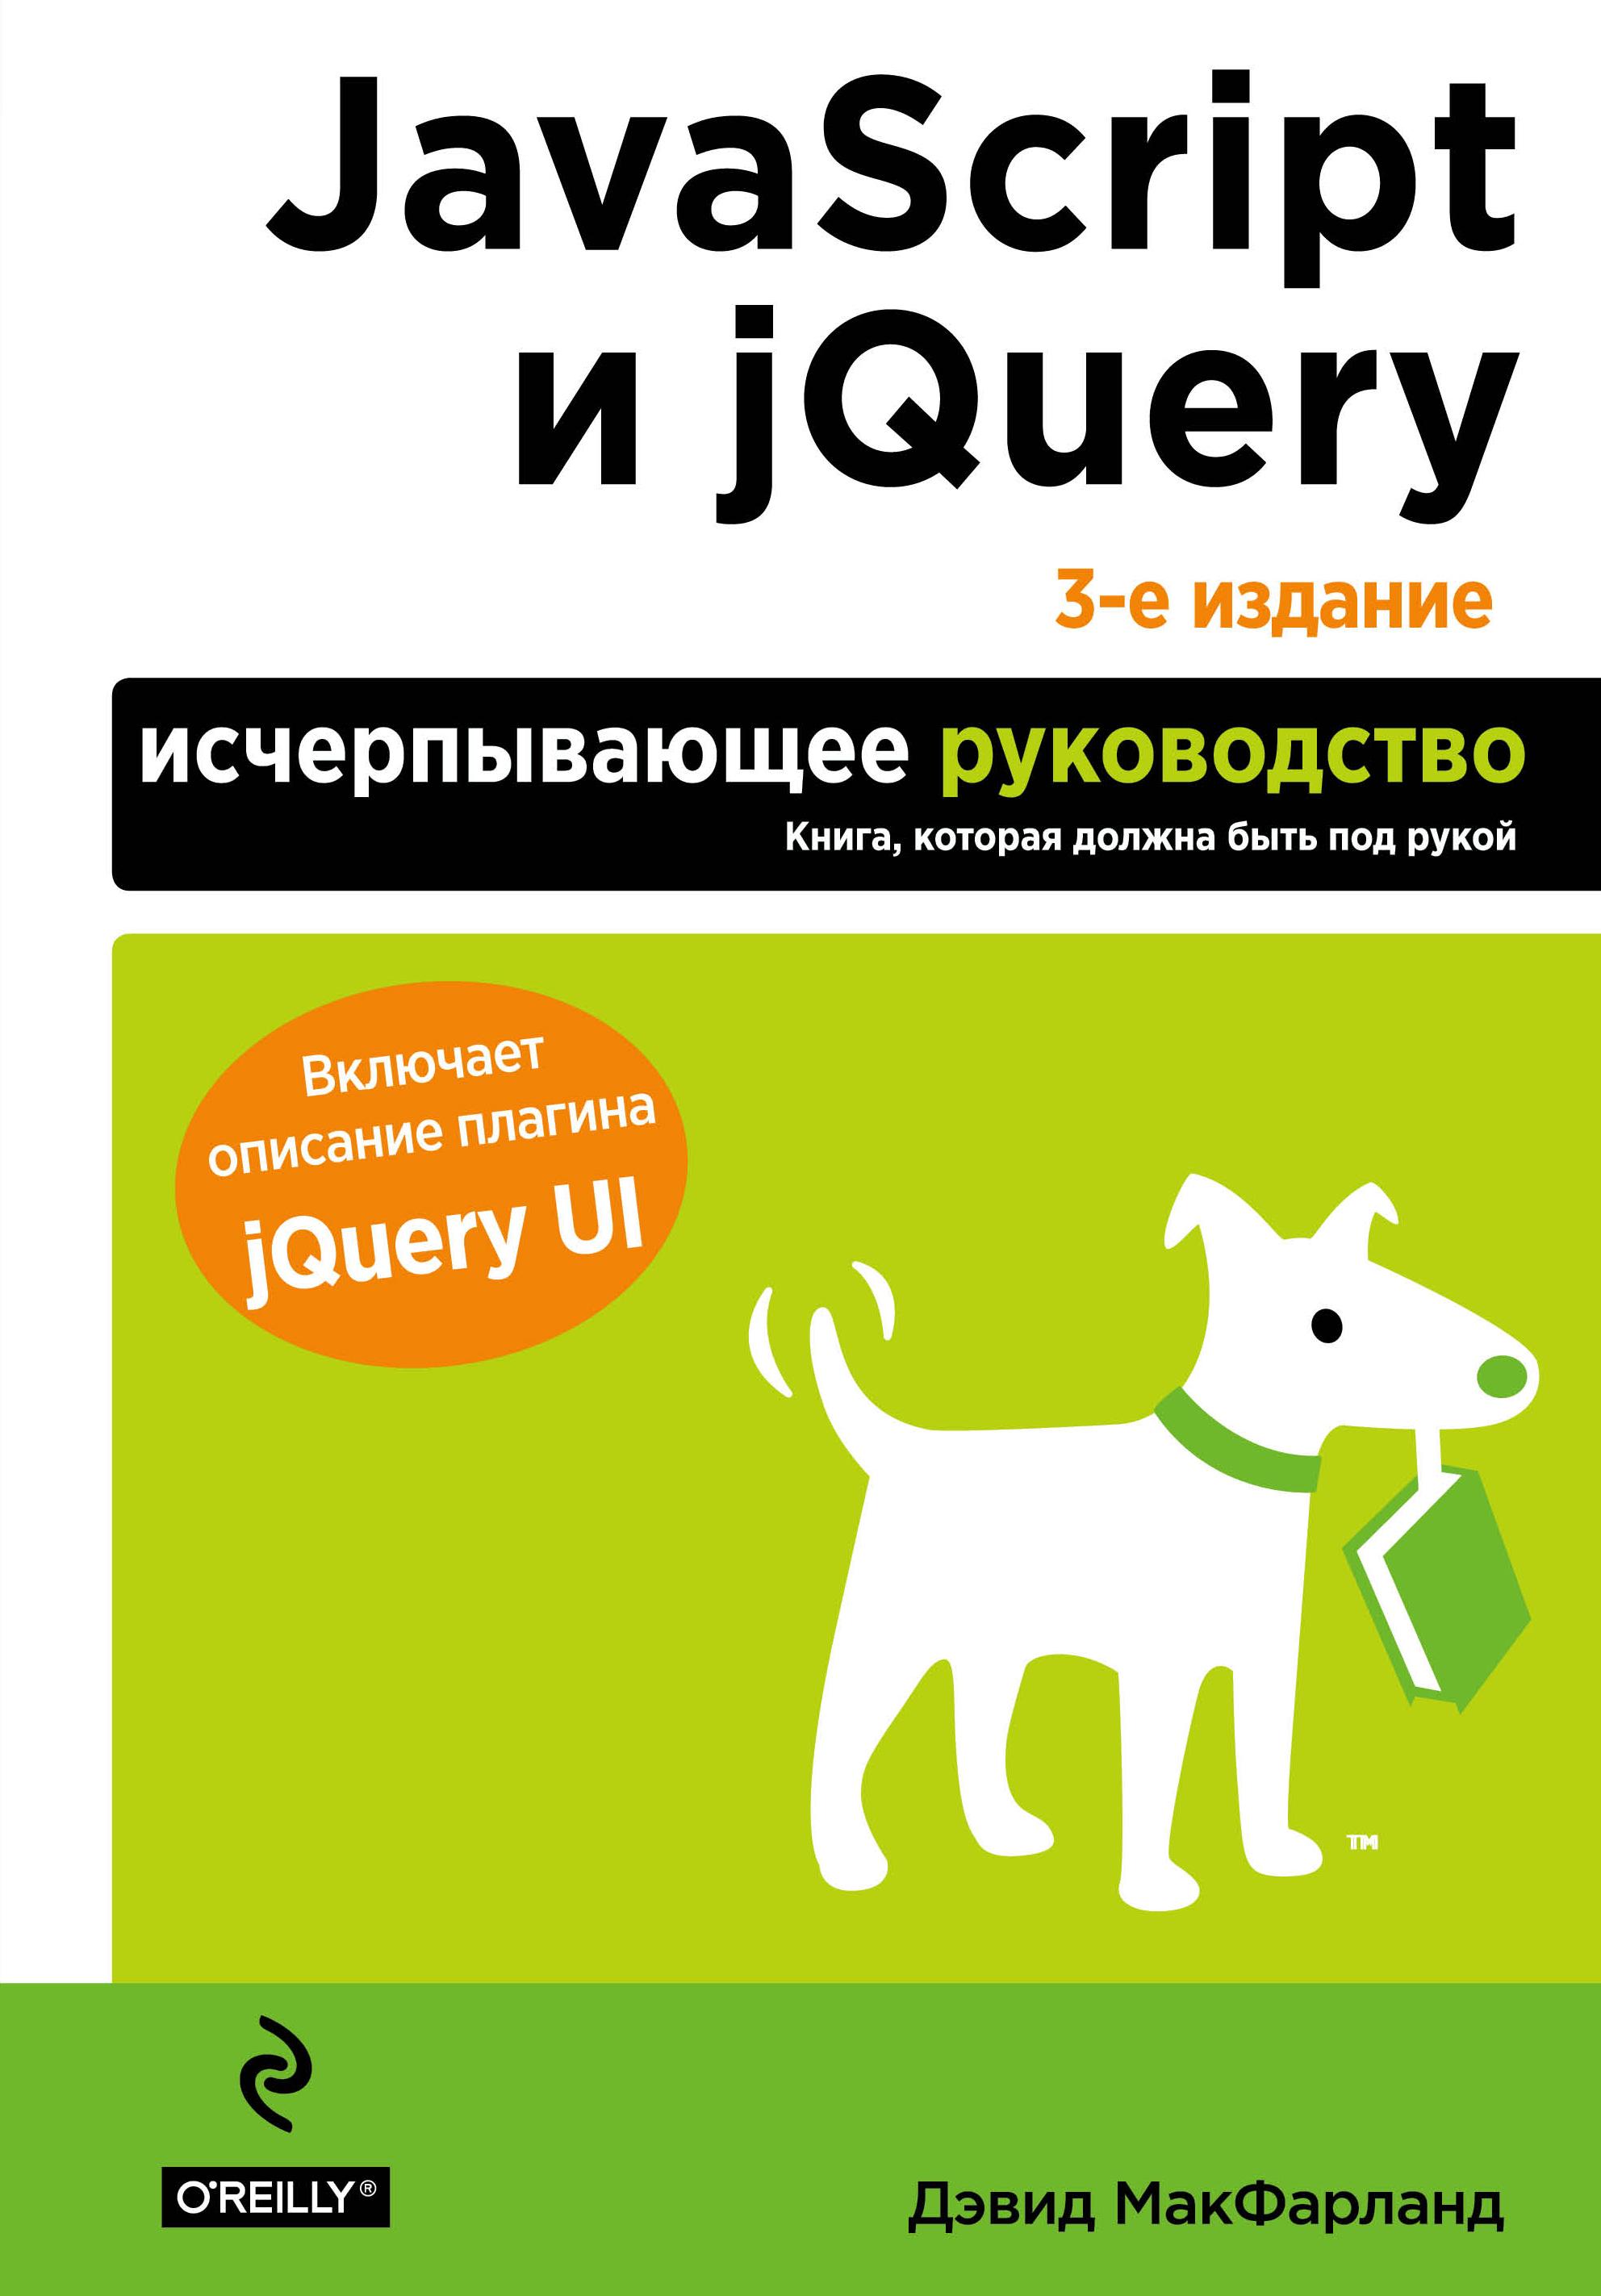 Дэвид Макфарланд JavaScript и jQuery. Исчерпывающее руководство